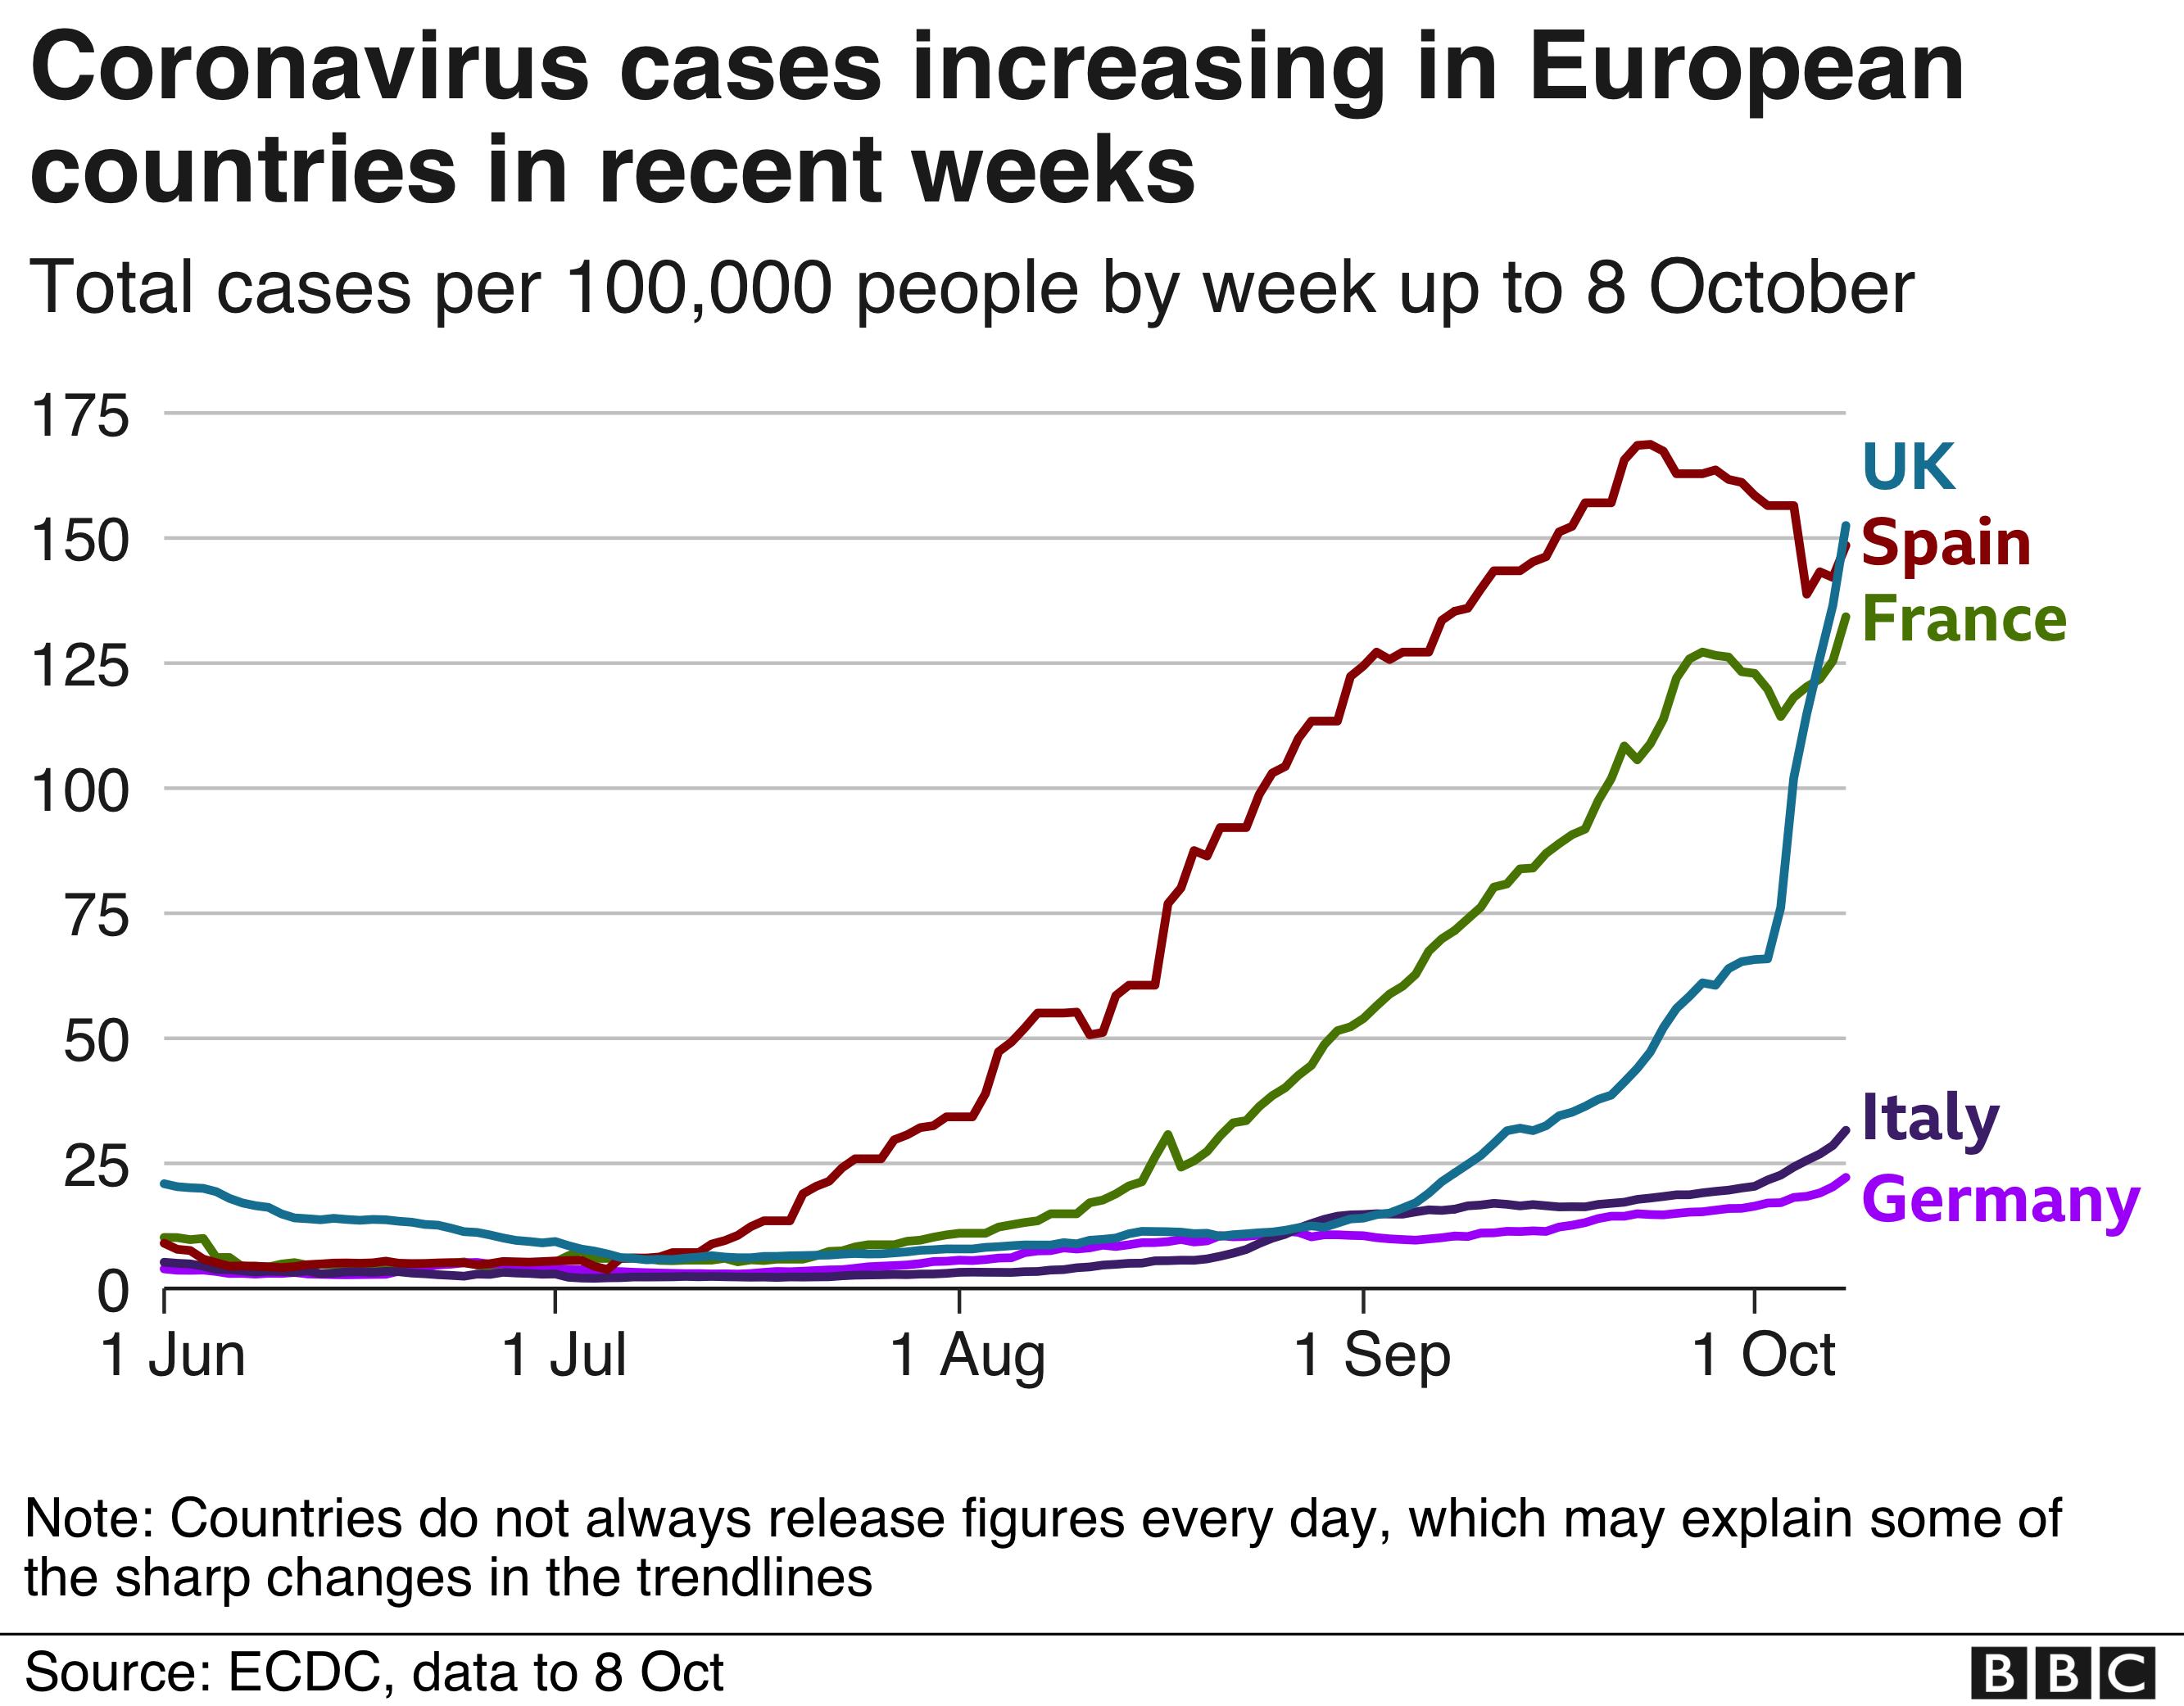 Coronavirus cases in Europe